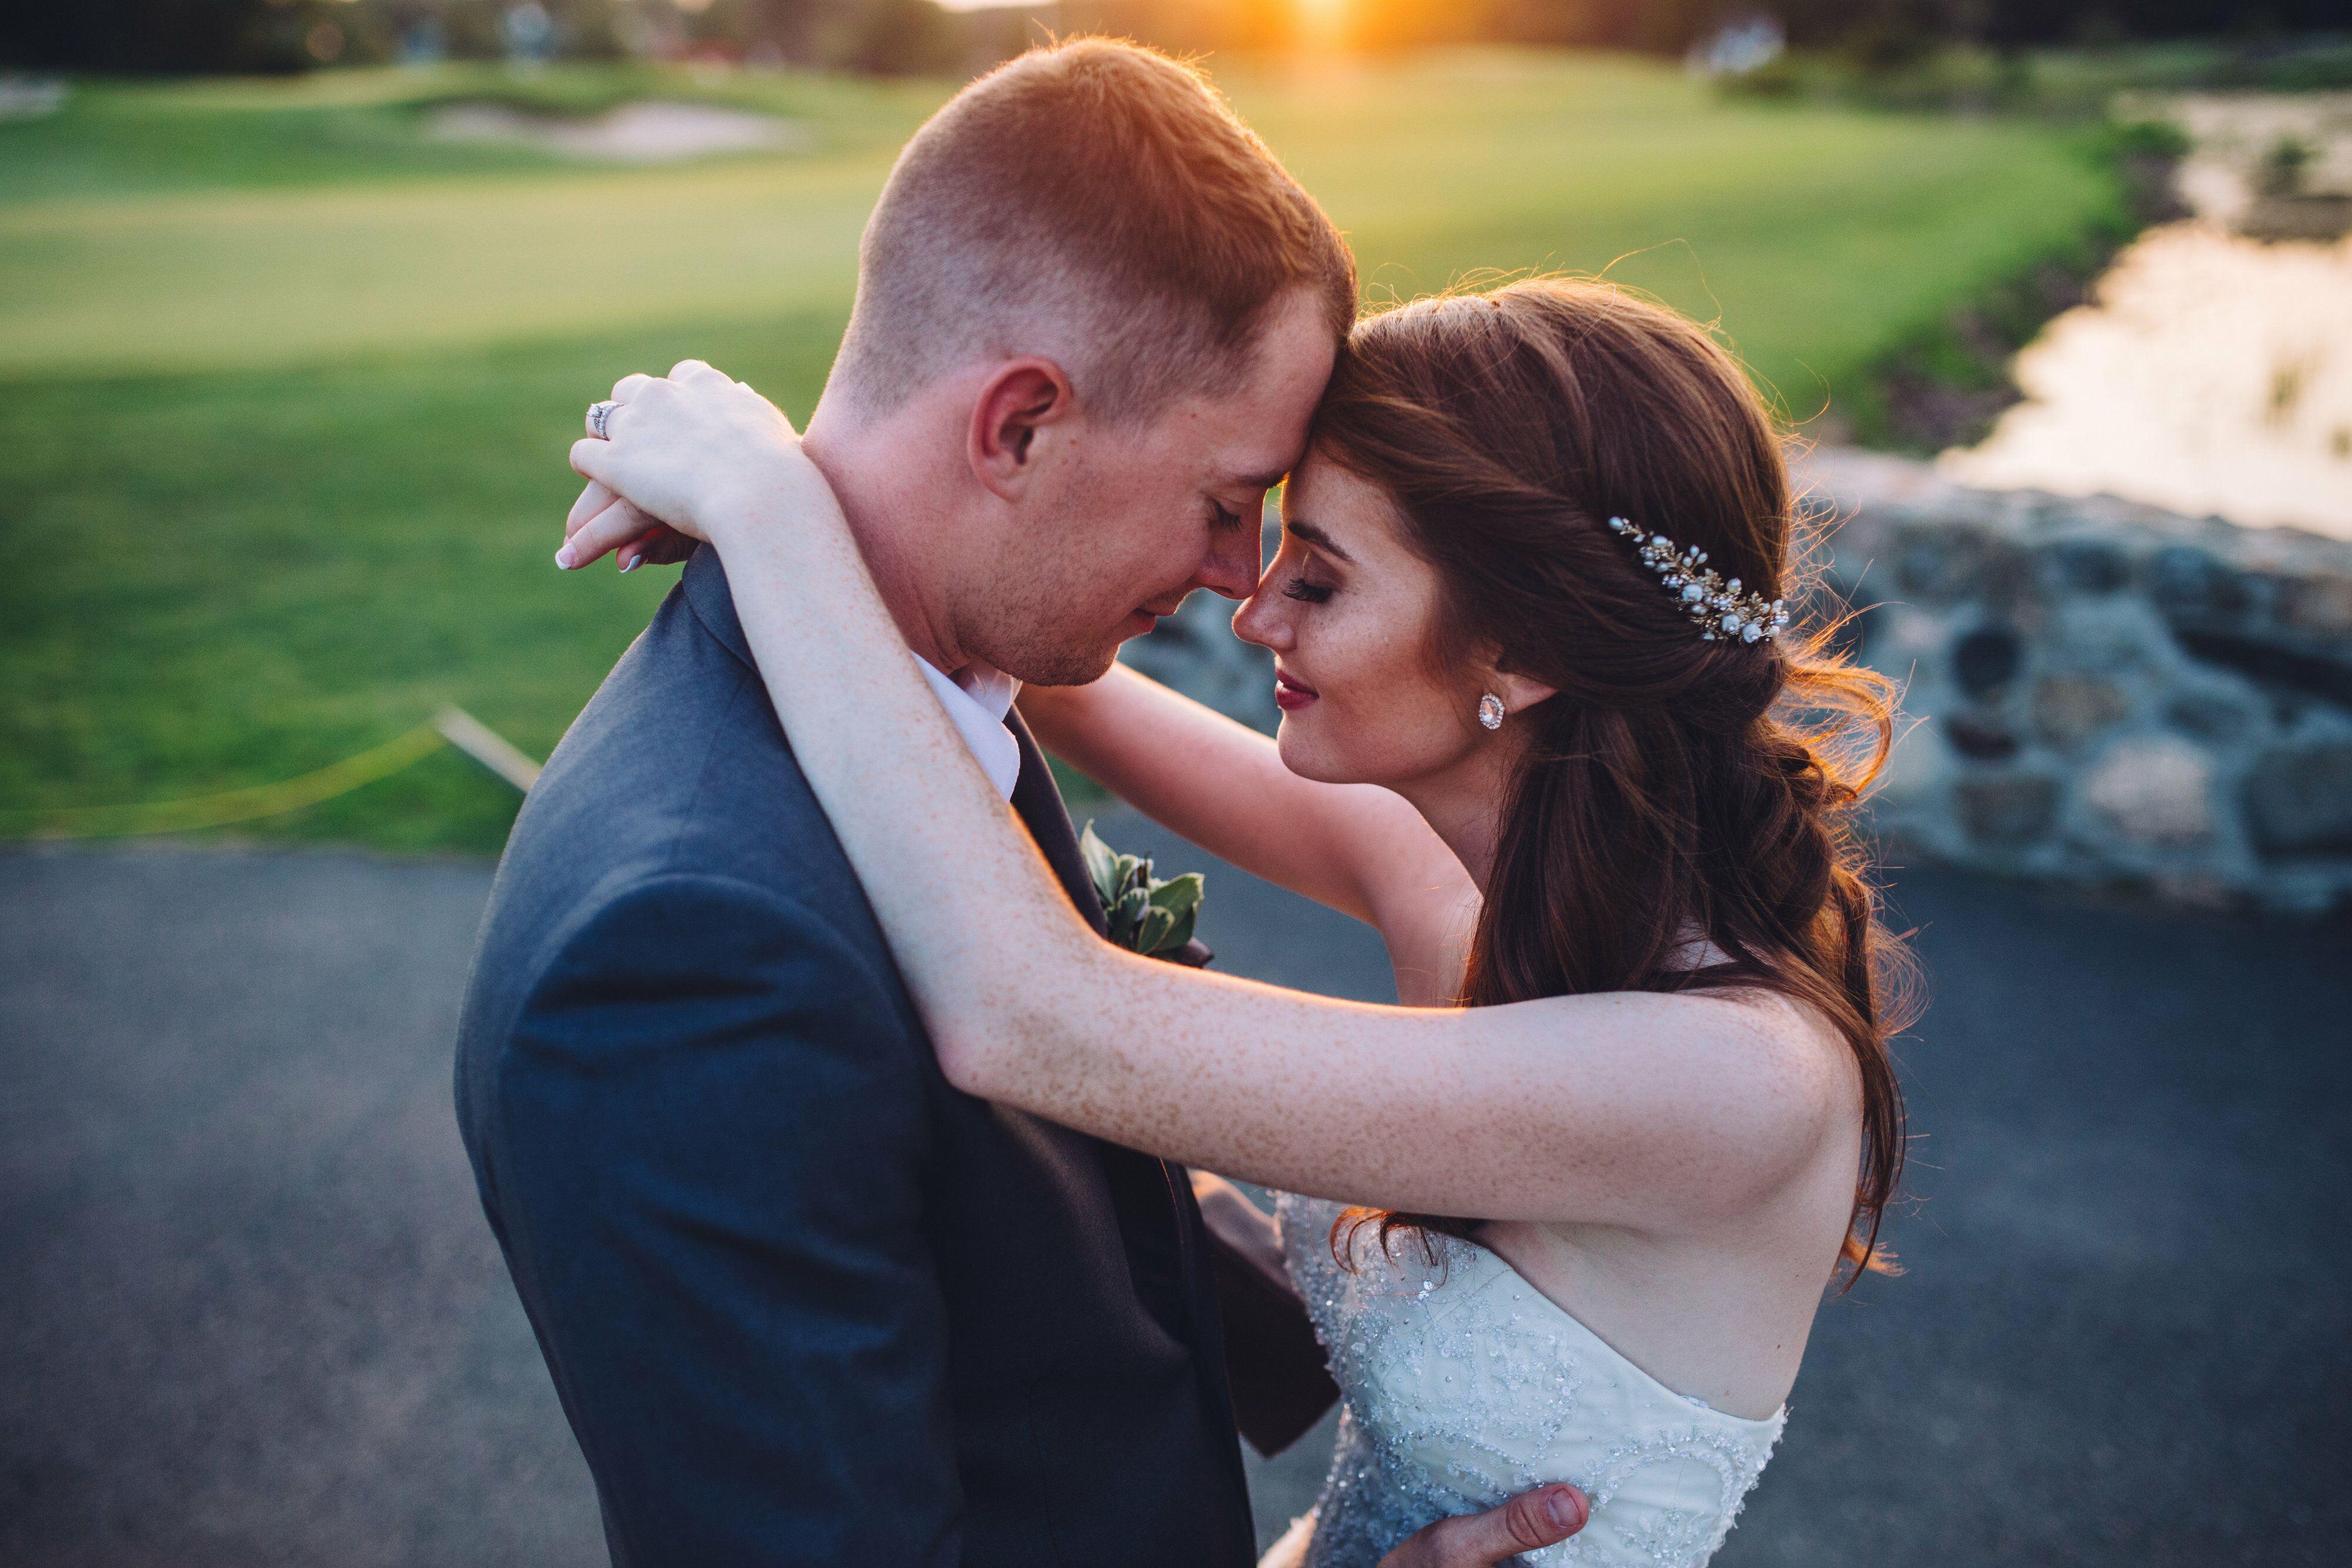 Wedding Reception Venues In Ipswich MA